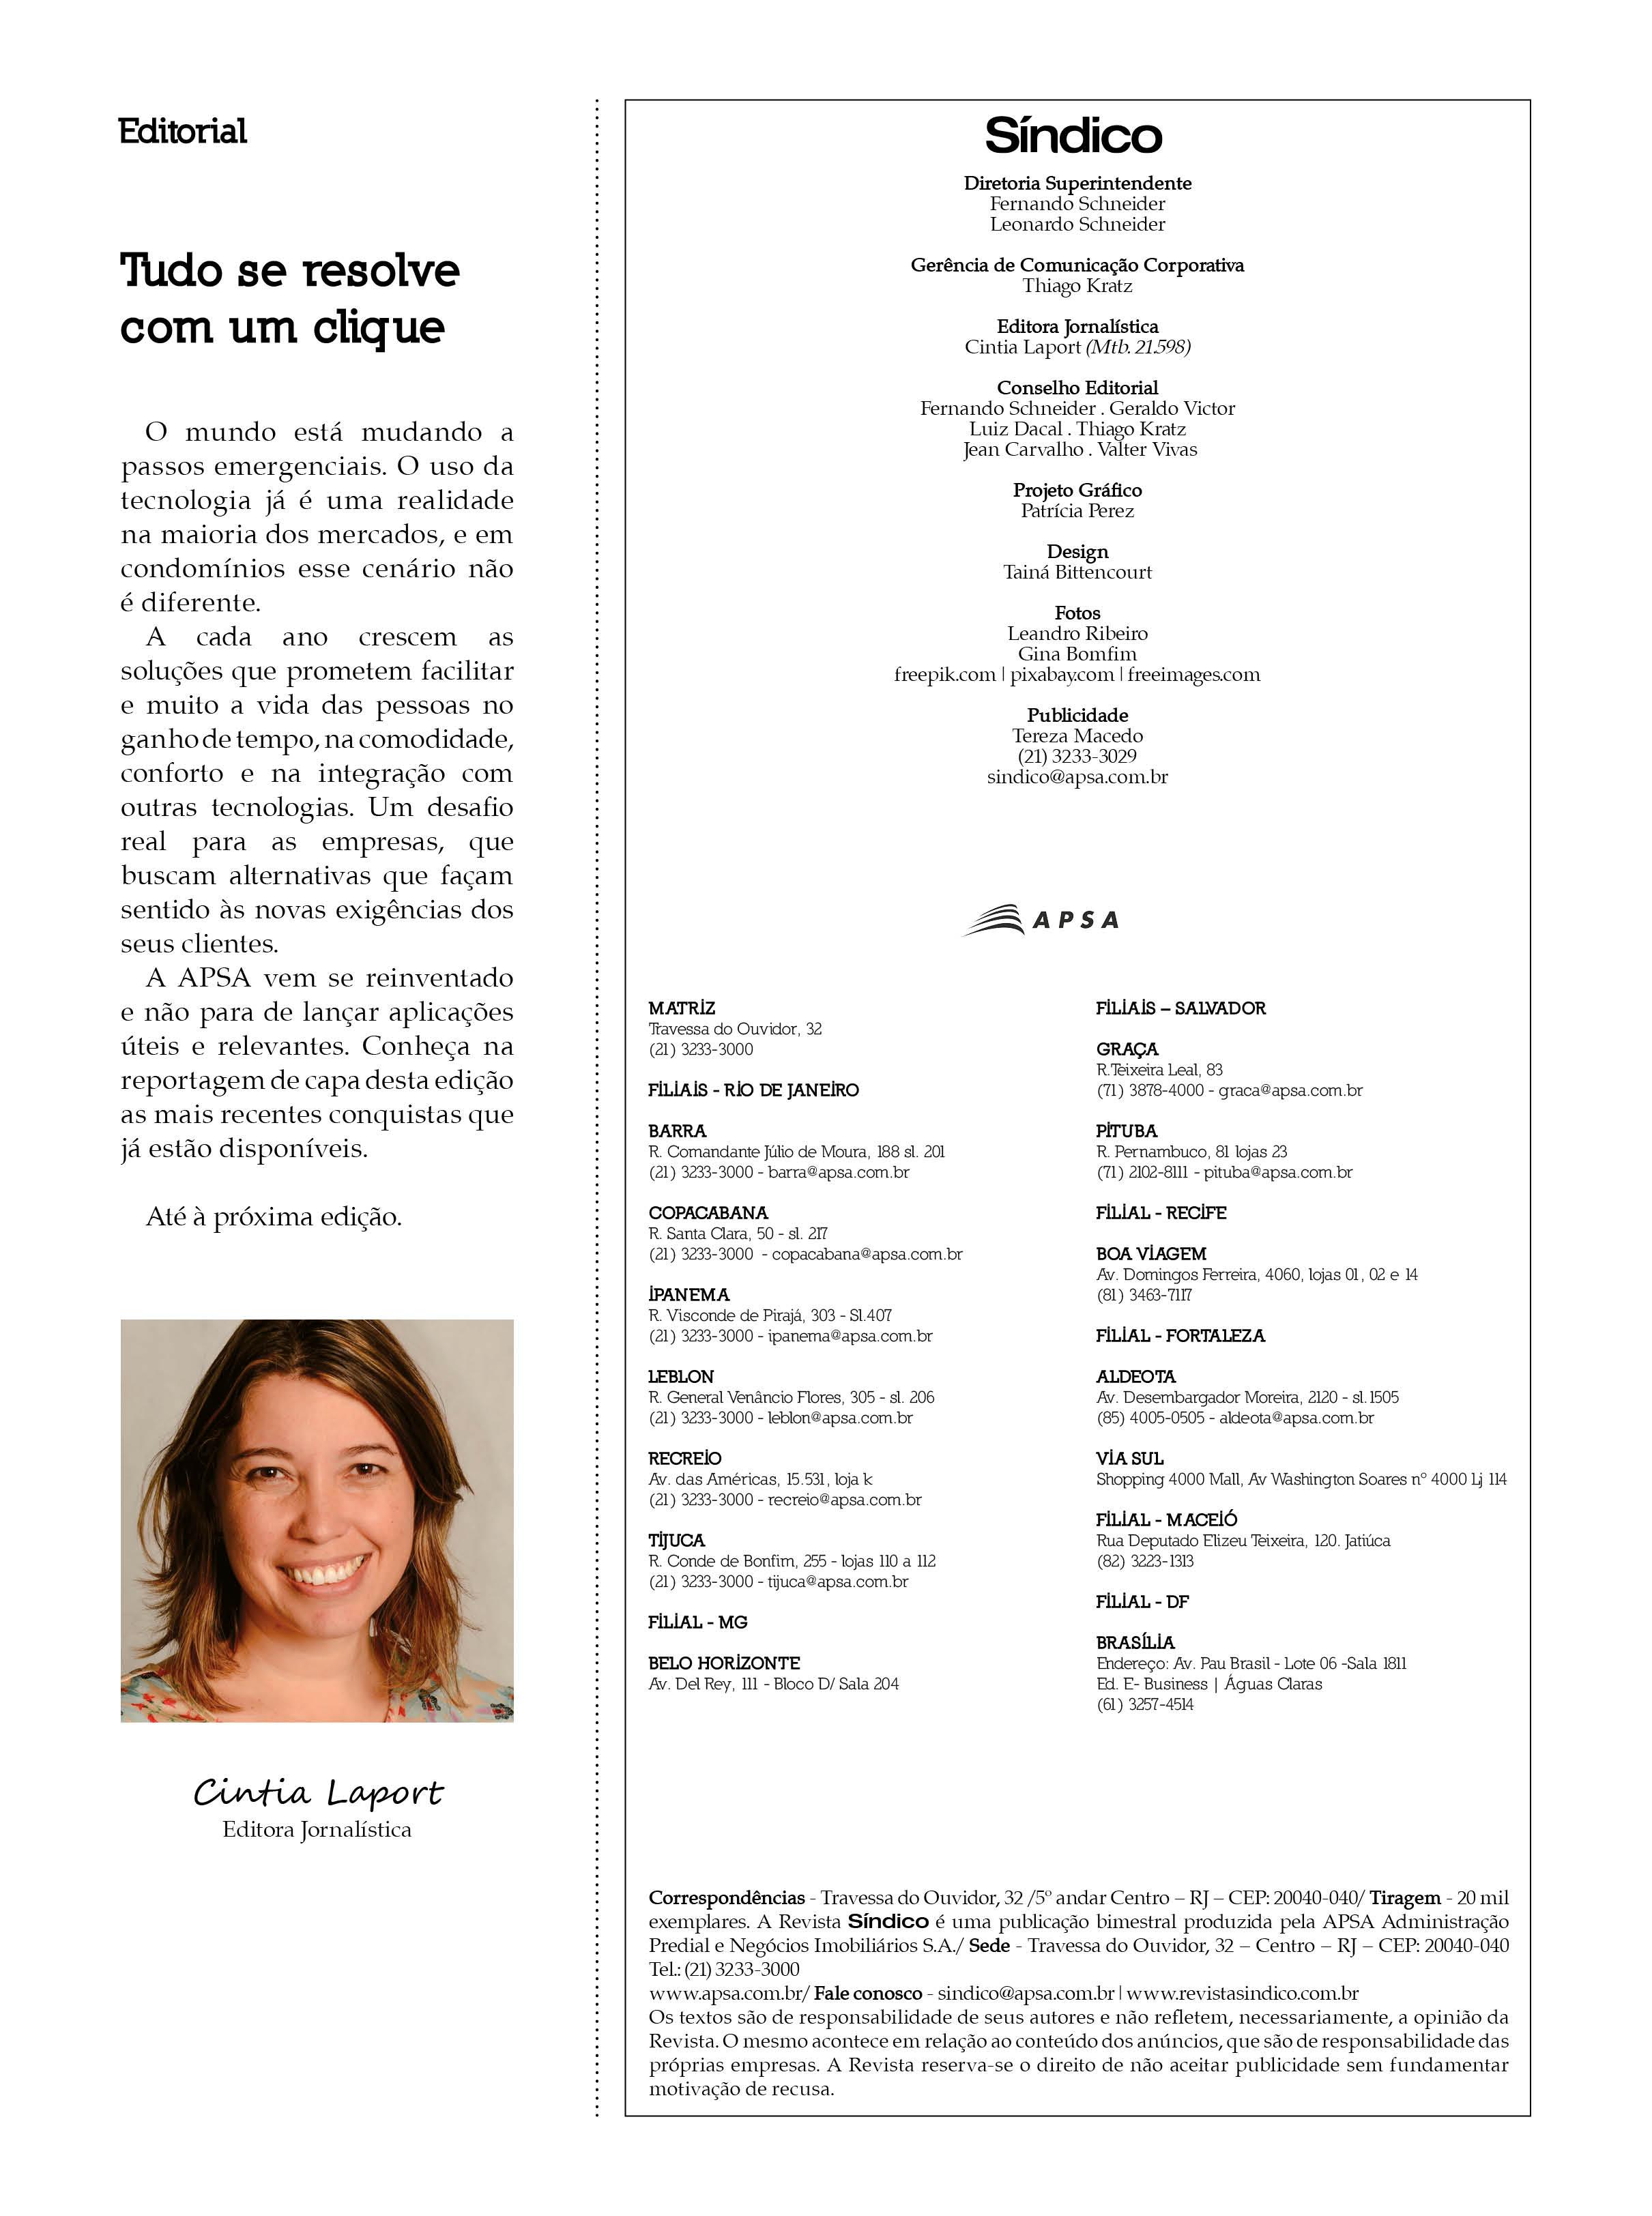 Revista Síndico_ed 246_2